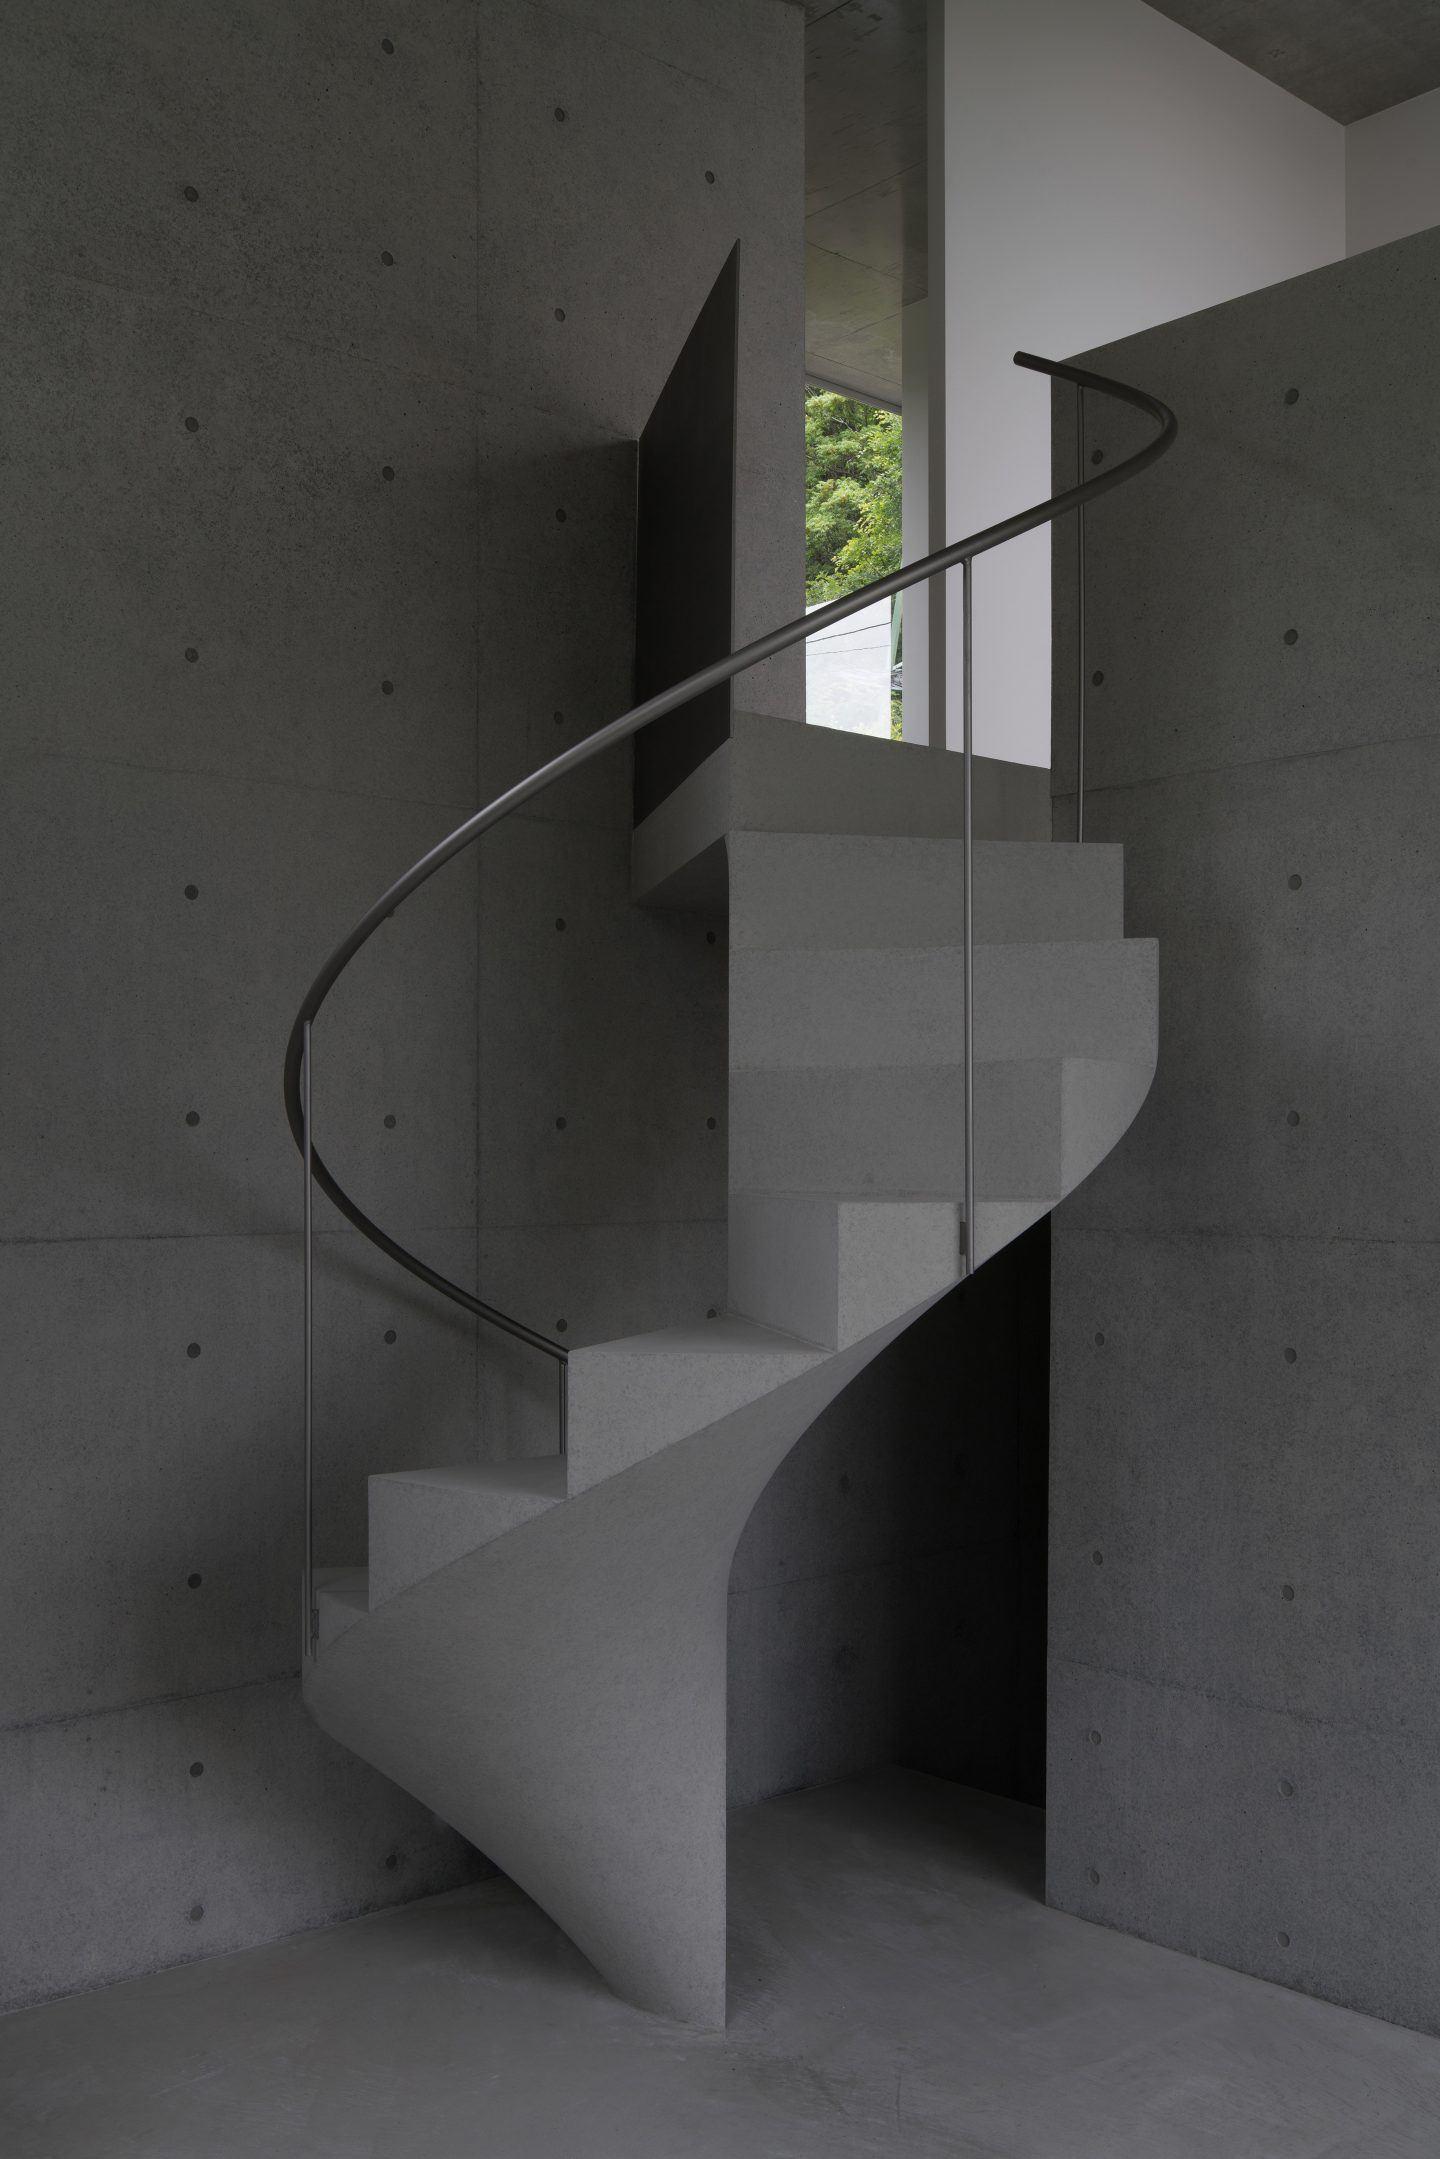 IGNANT-Architecture-Residential-Kazunori Fujimoto-13